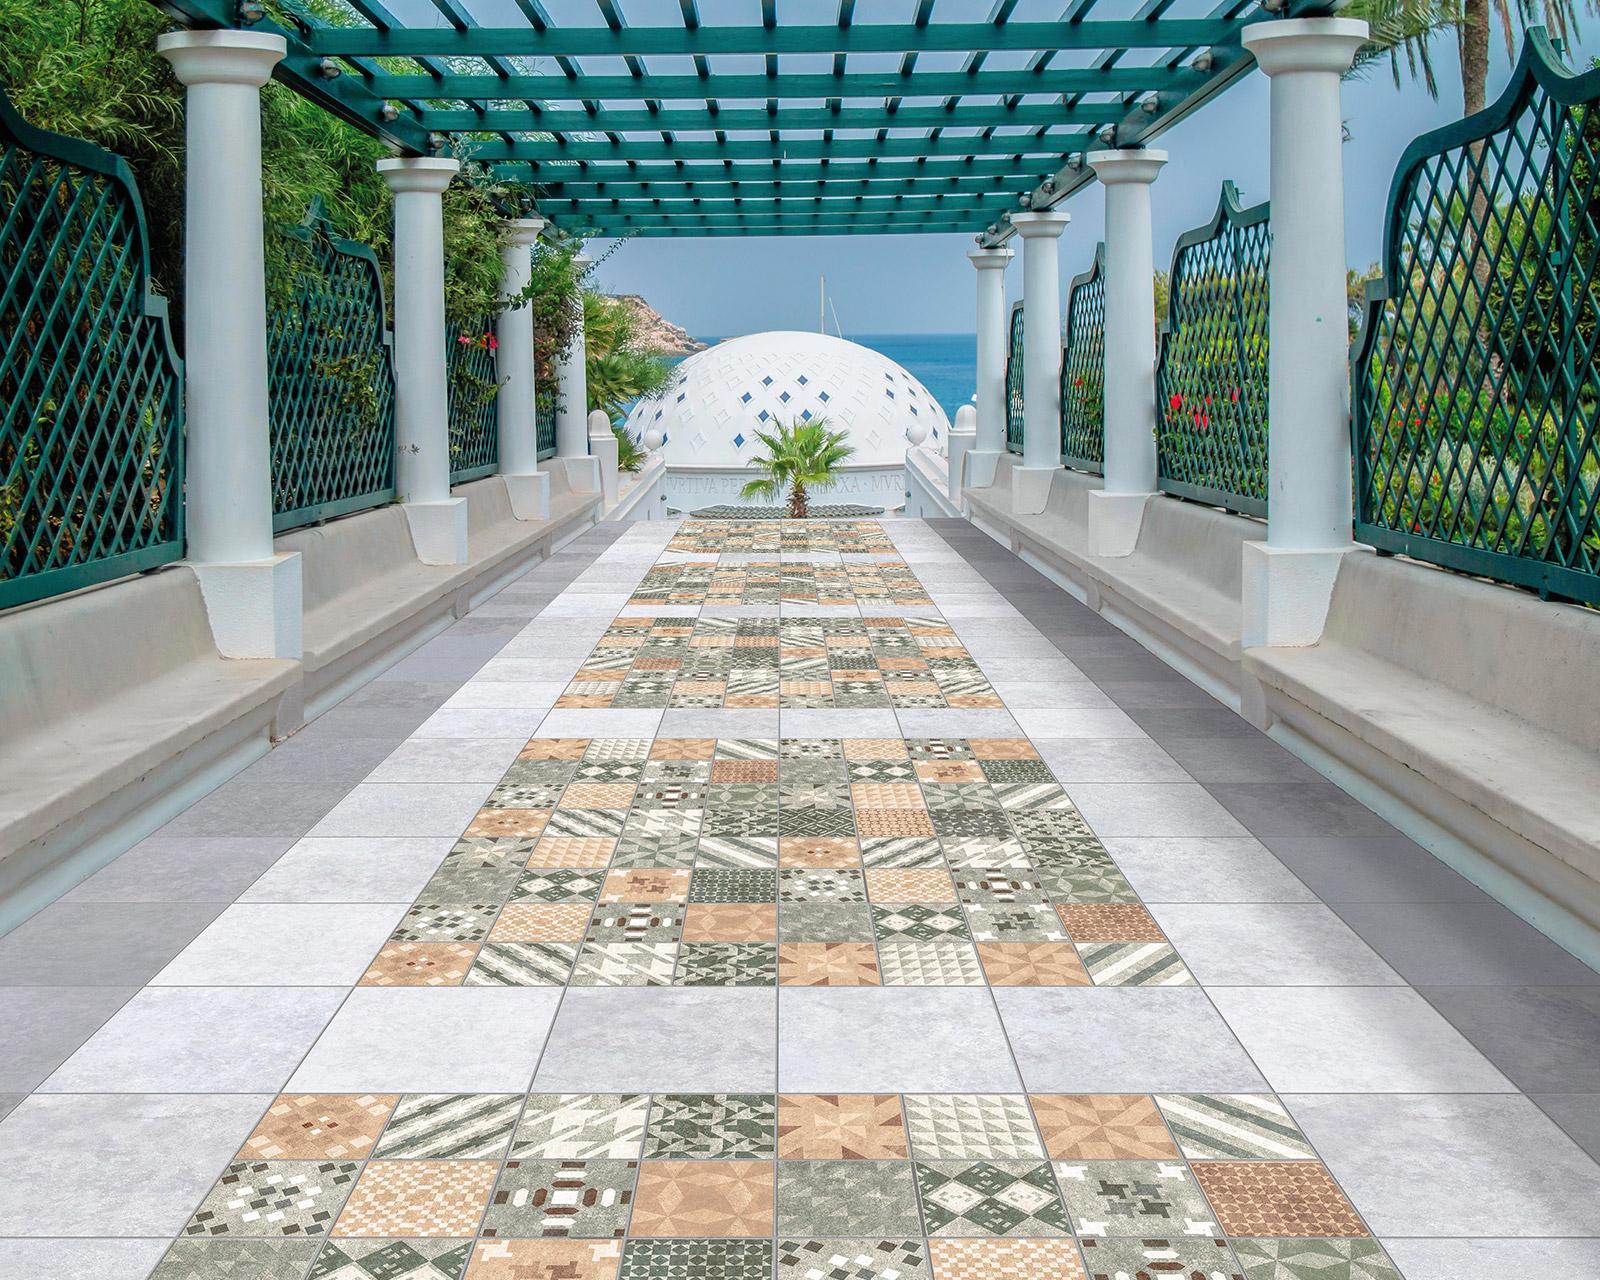 Perlato Tiles